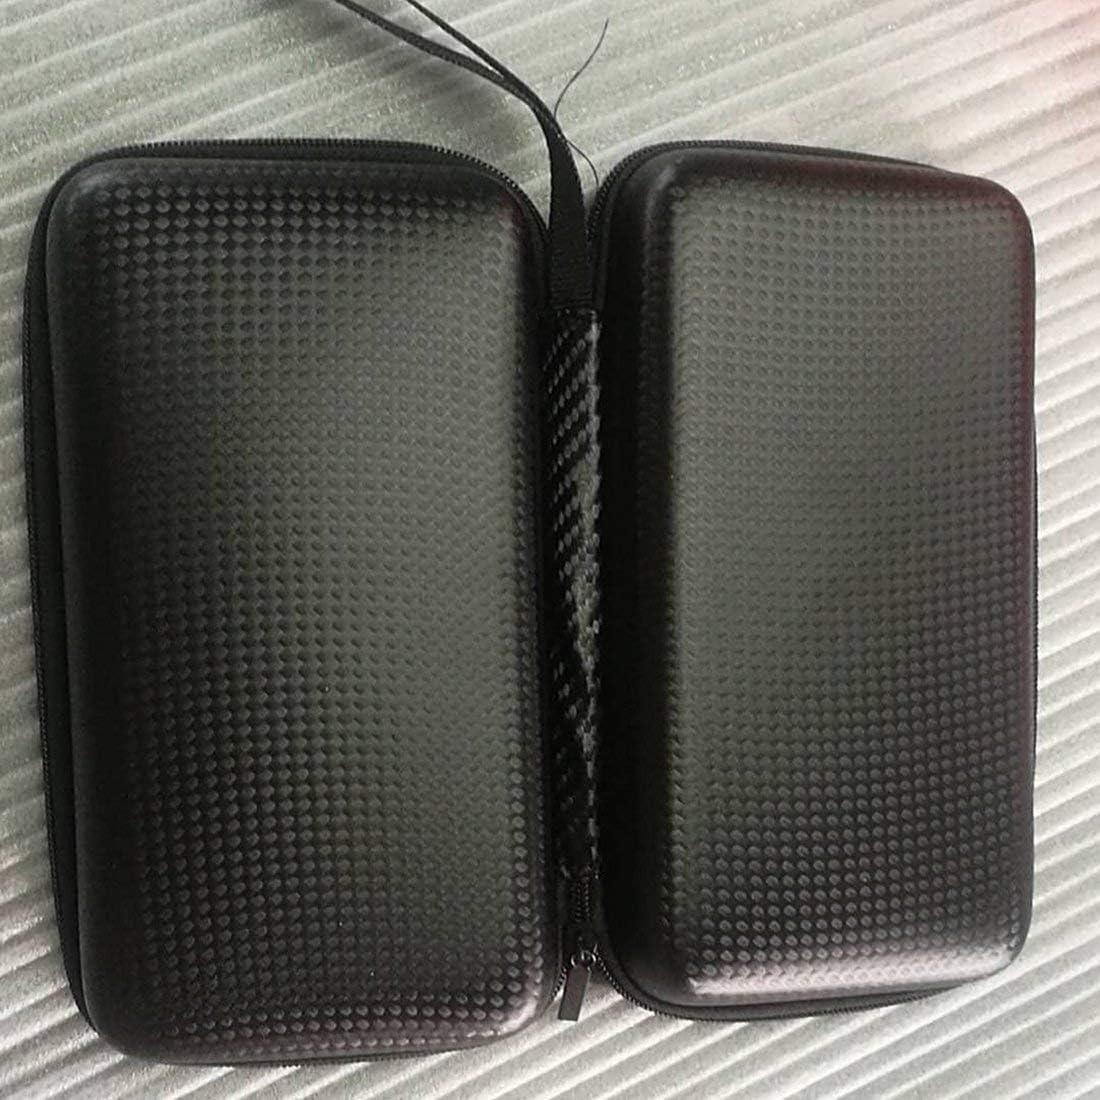 30000mAh Portable Car Jump Starter Pack Booster LED Chargeur Batterie Power Bank Portable Urgence D/émarrage Alimentation//Noir